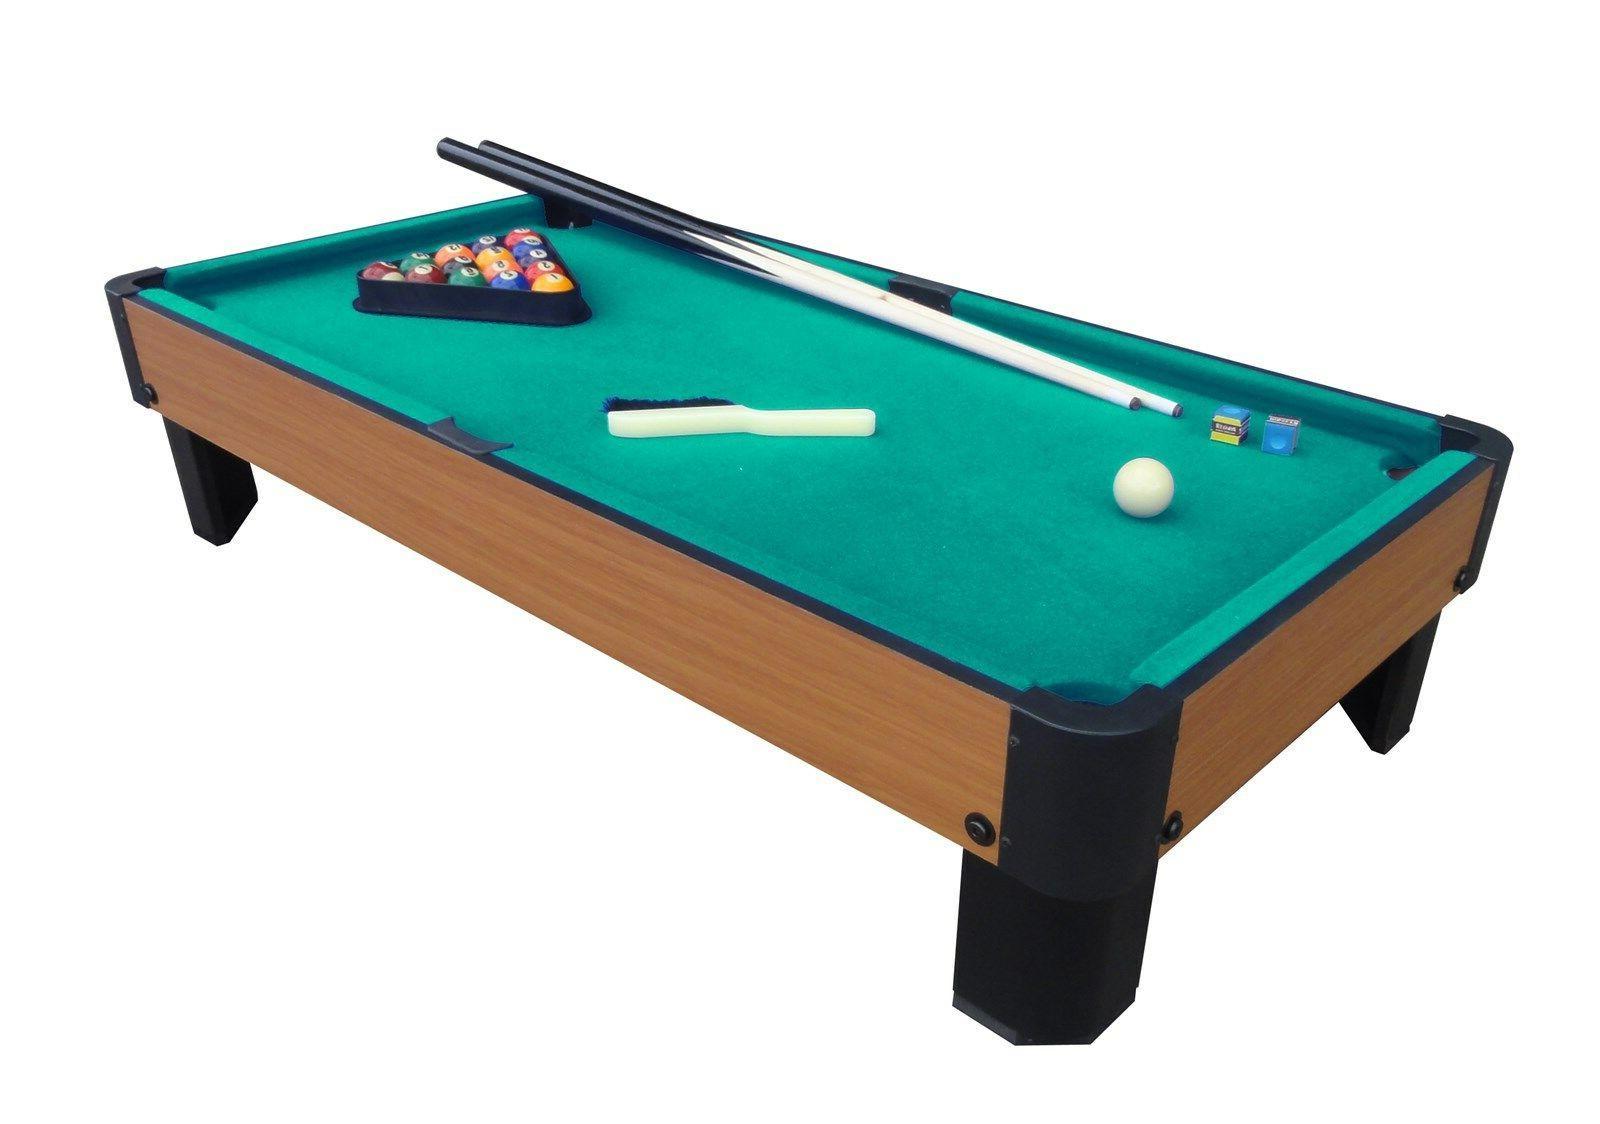 bank shot 40 pool table green cloth